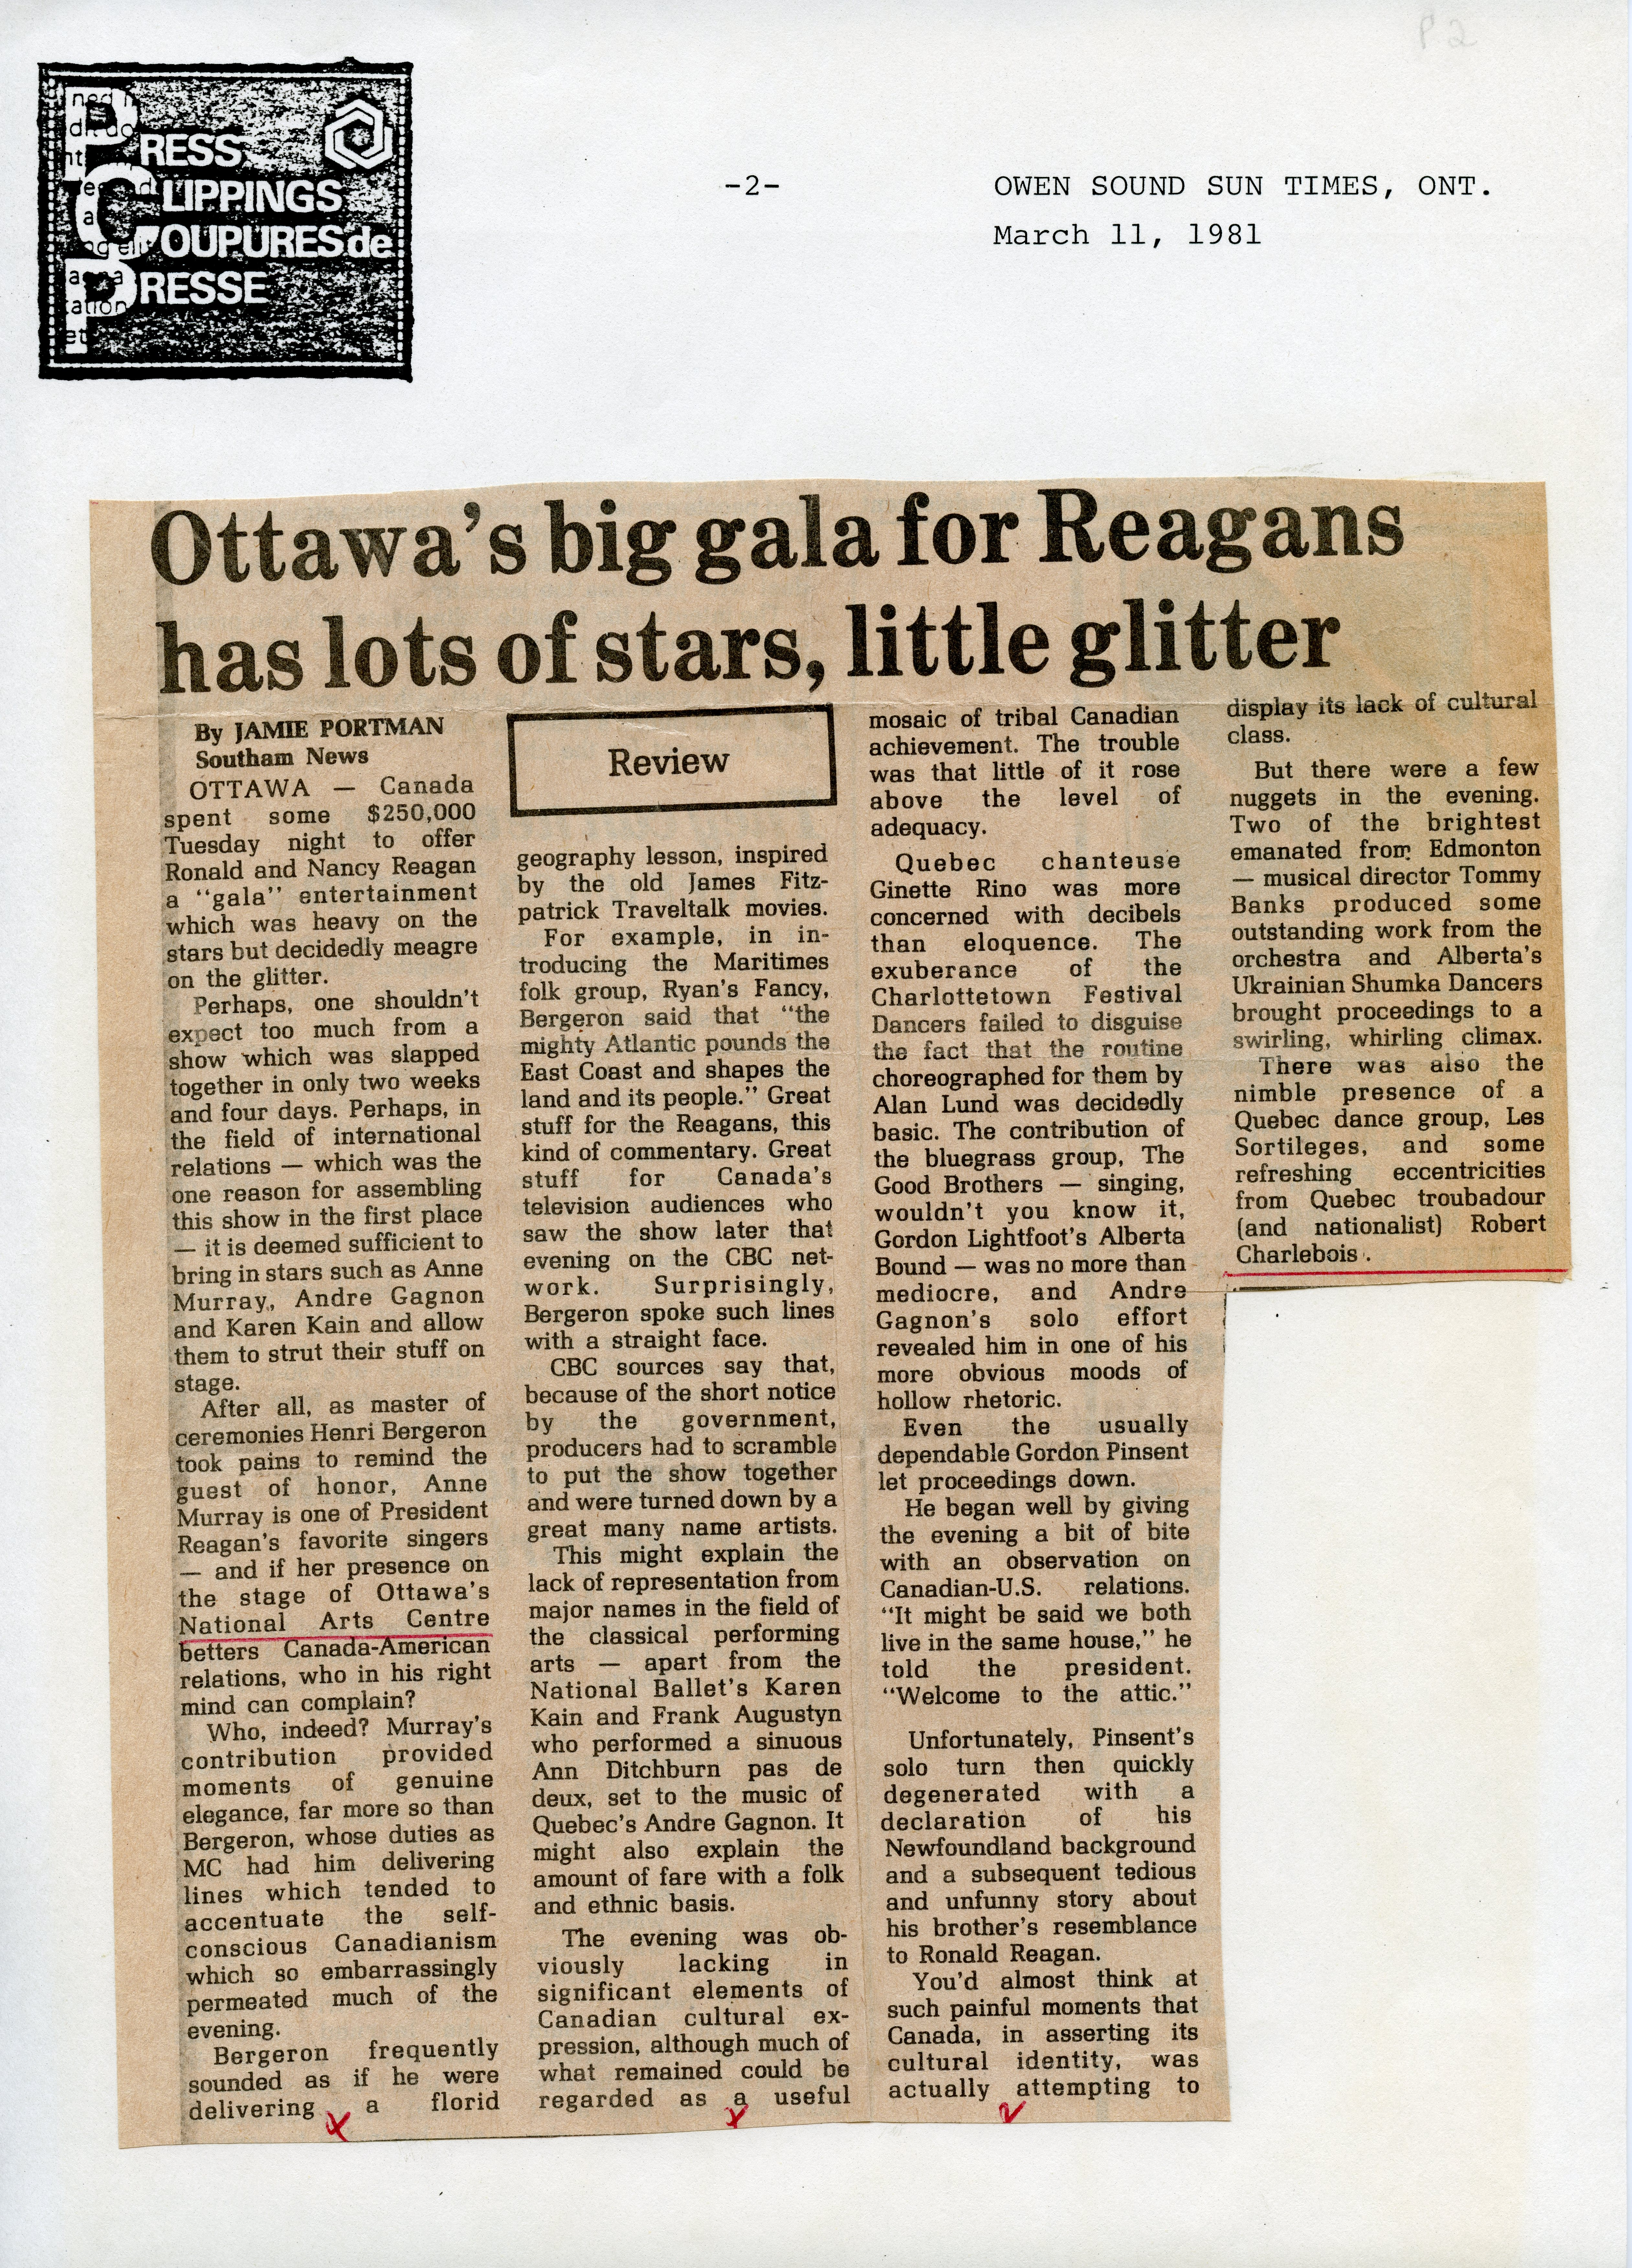 Ottawa's Big Gala for Reagan has Lots of Stars, Little